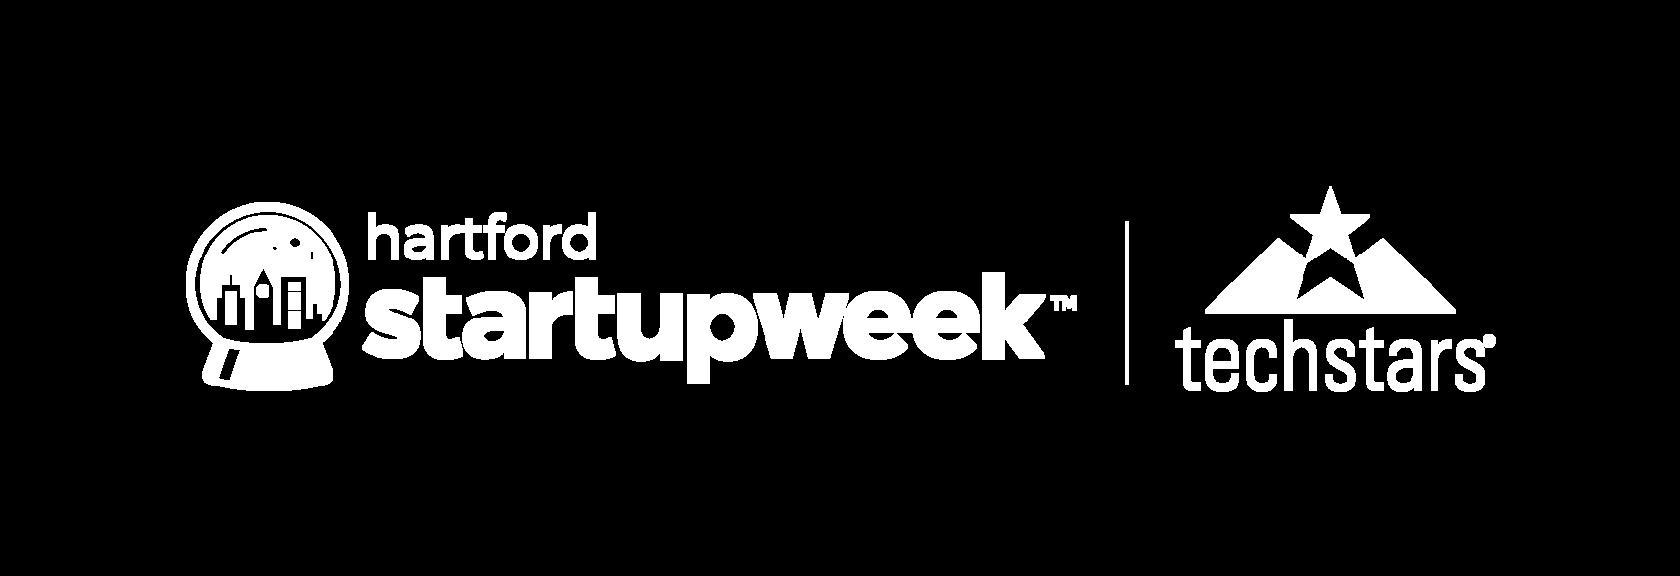 Techstars Startup Week Hartford